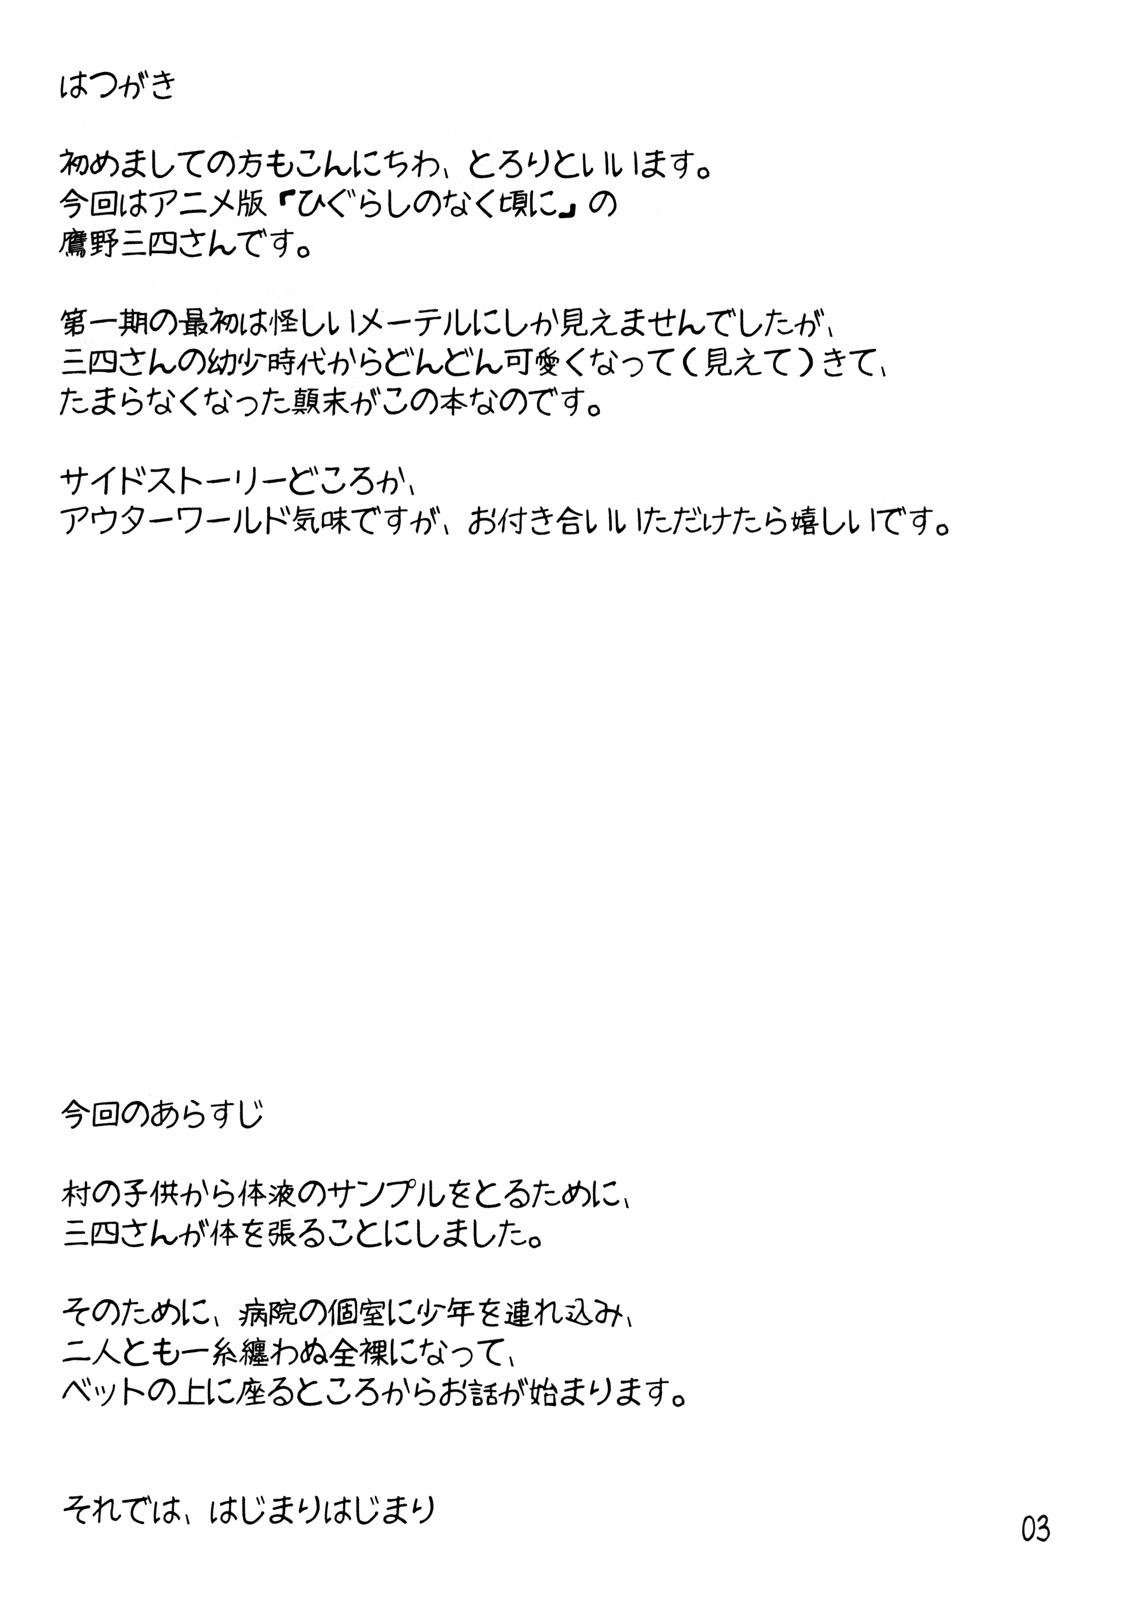 Takano Miyo to Issho! 1